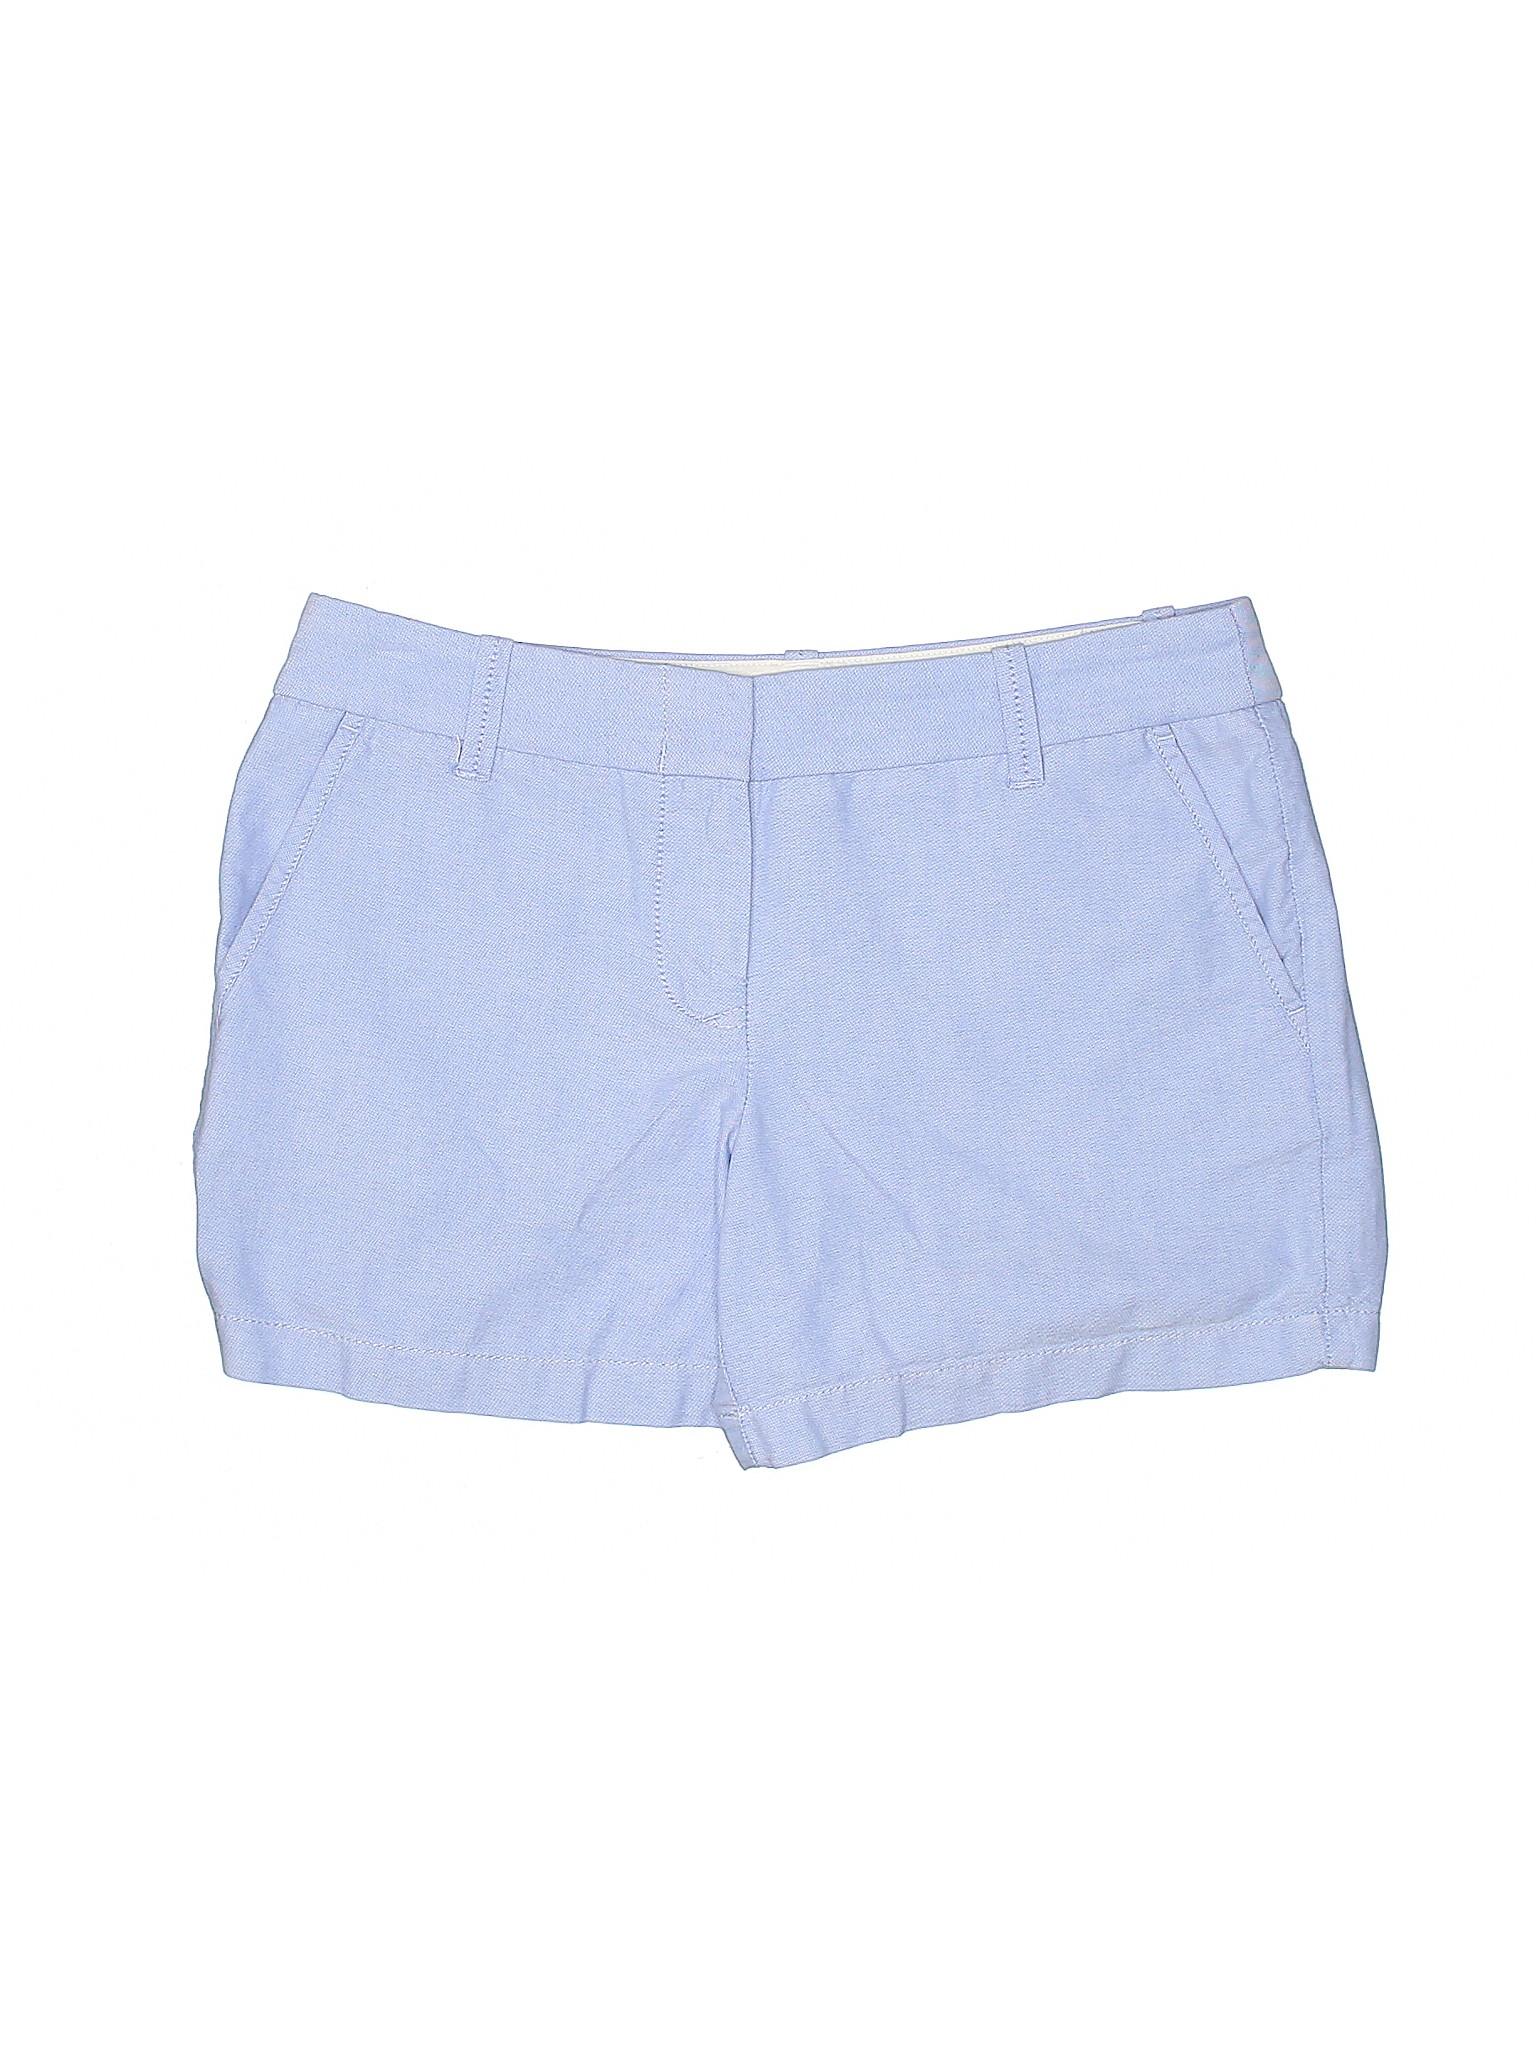 Crew Crew Boutique Shorts Factory J Store S1q06X